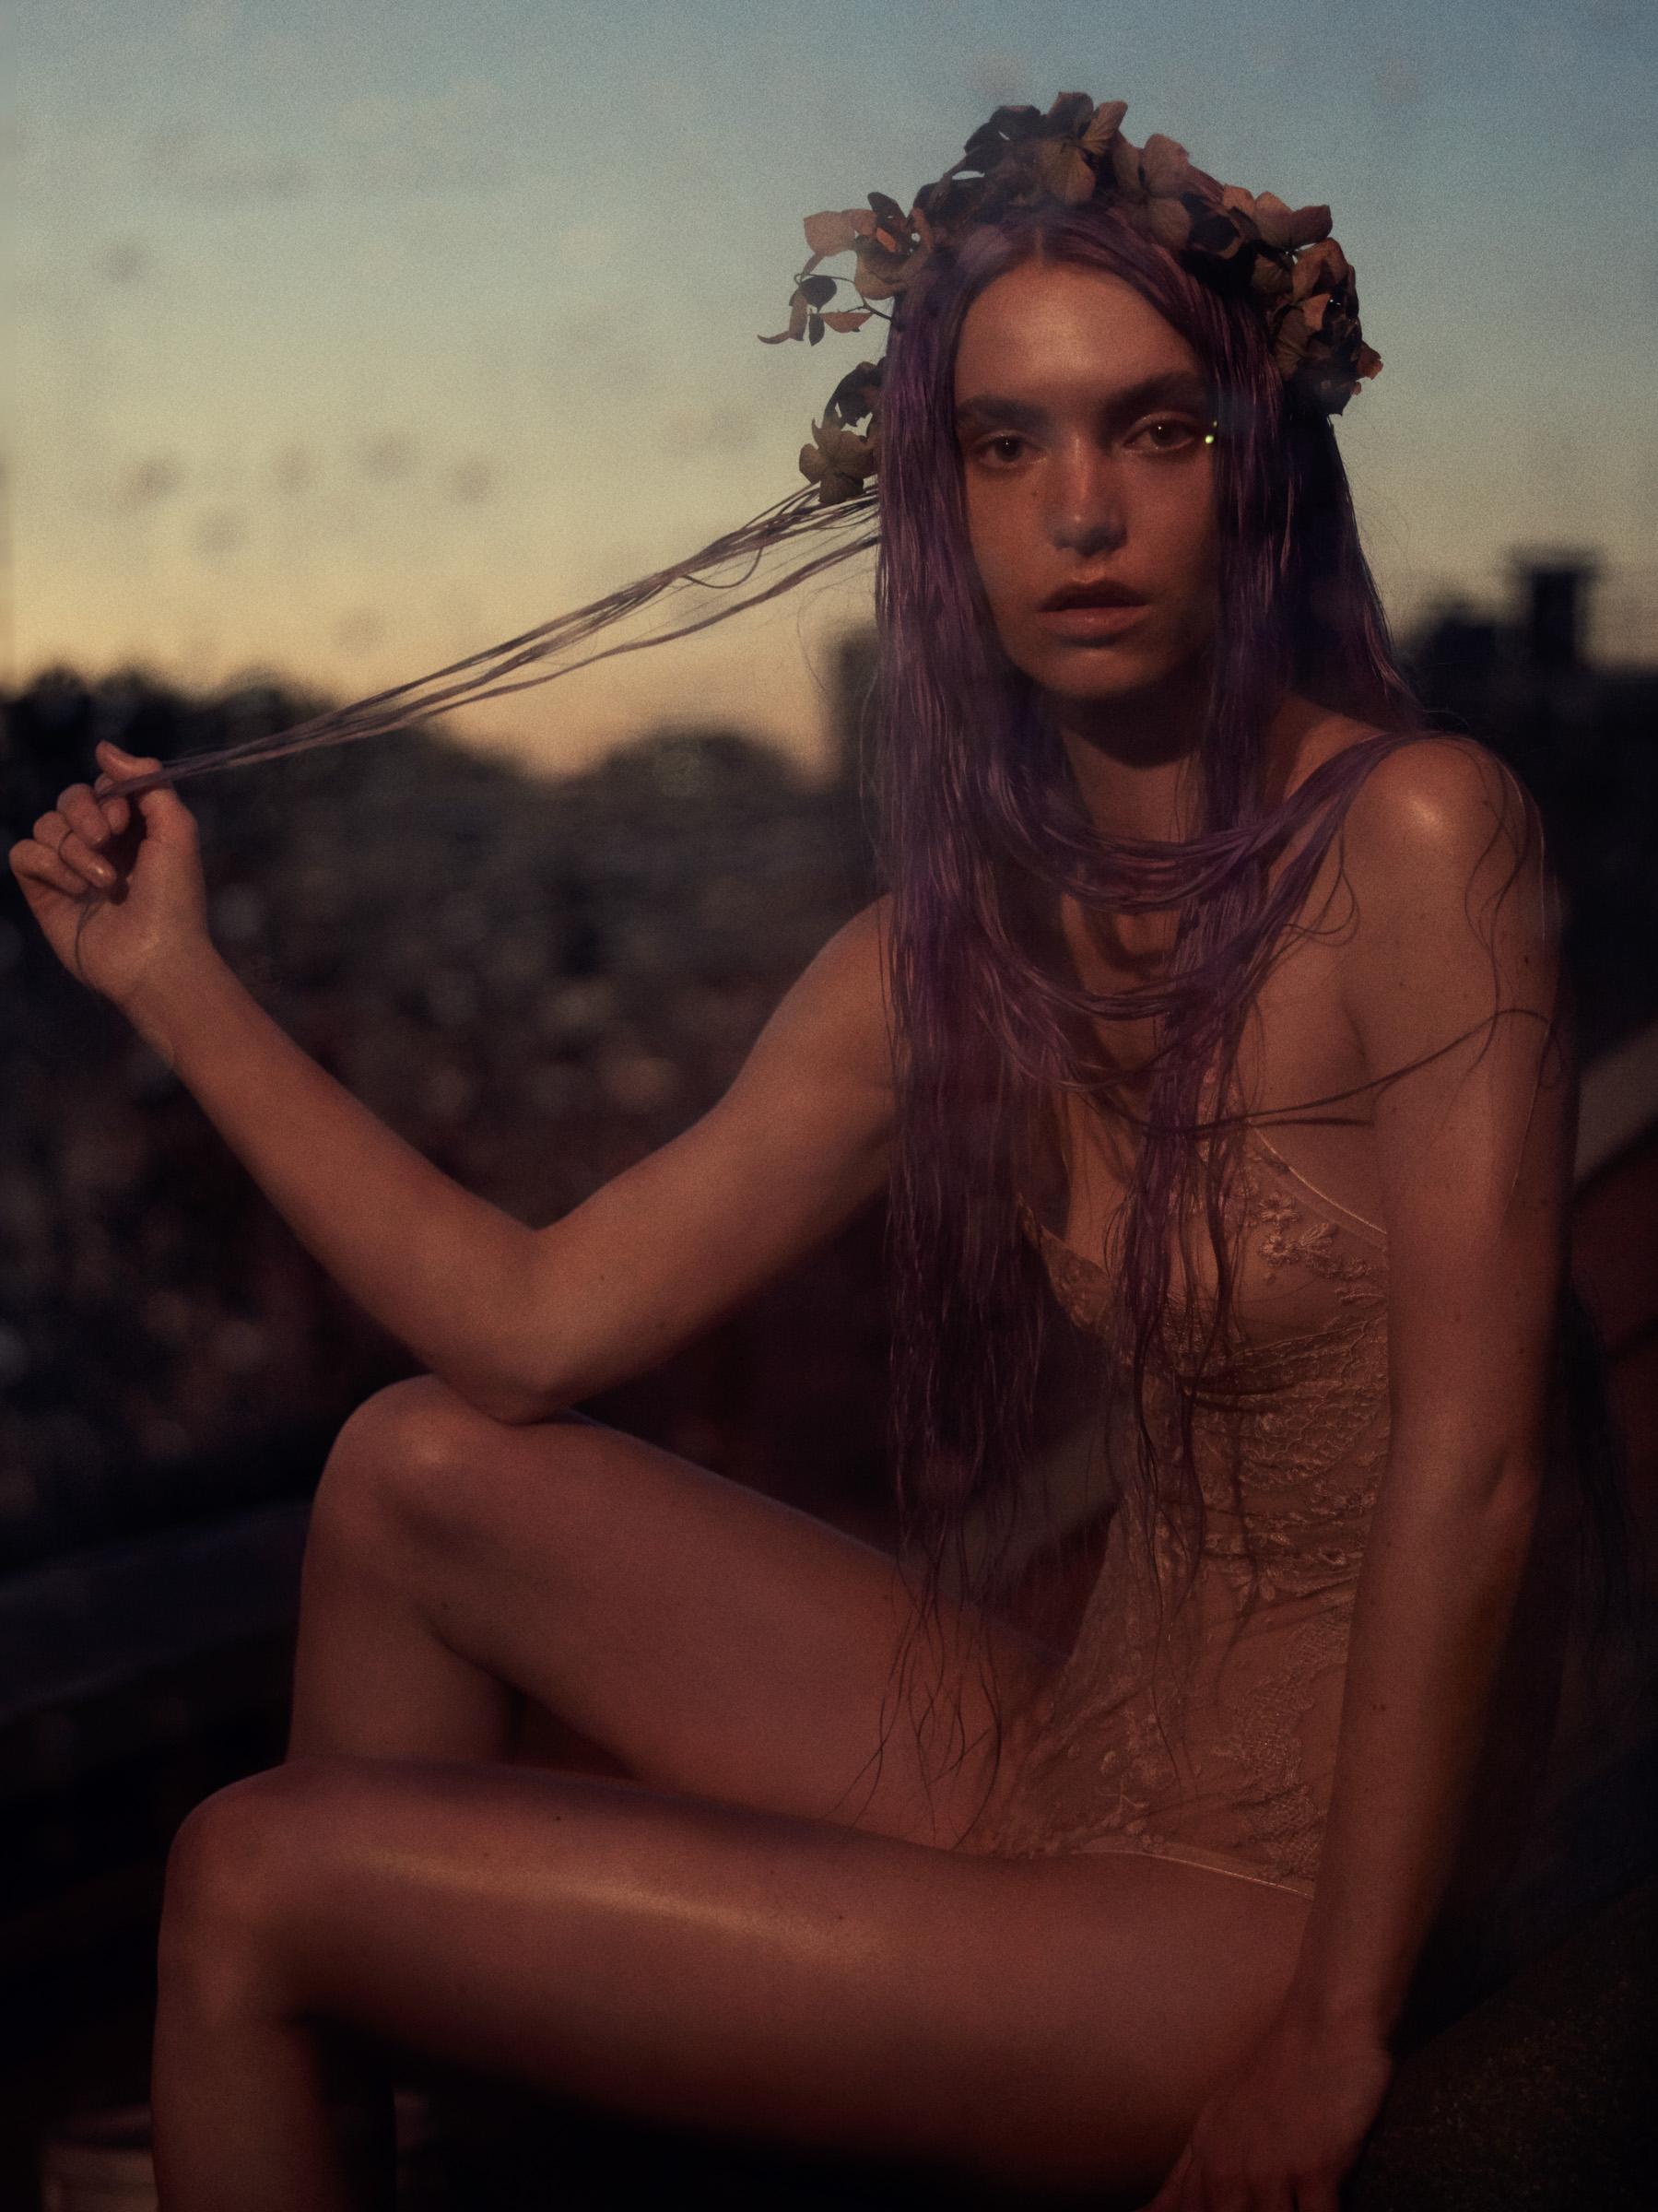 Jack-Eames-Ali-Pirzadeh-Wigs-LA-Feeling-Hair-Beauty-Photography-Campaign-05.jpg